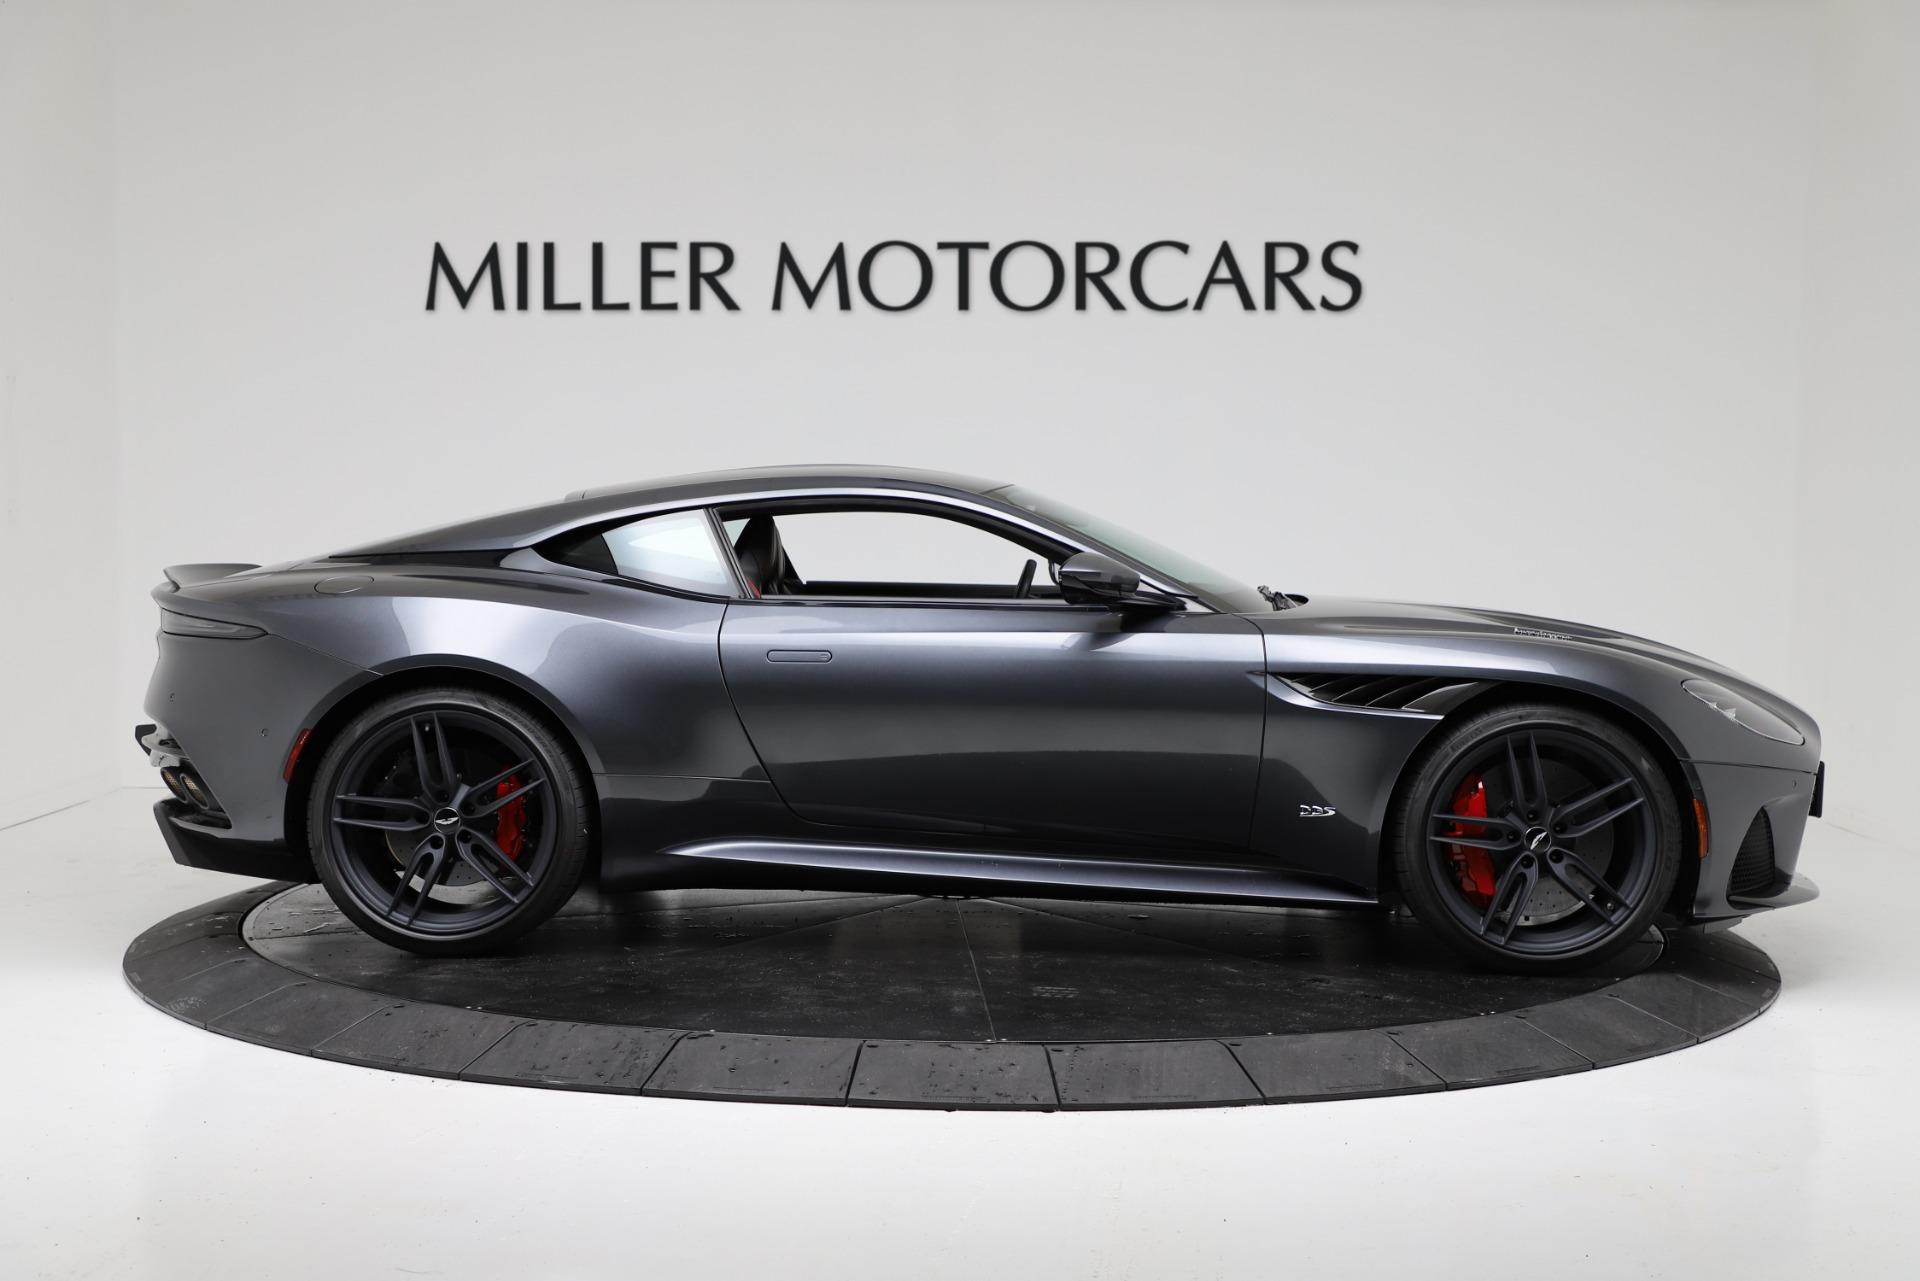 New 2019 Aston Martin DBS Superleggera For Sale In Westport, CT 3318_p8